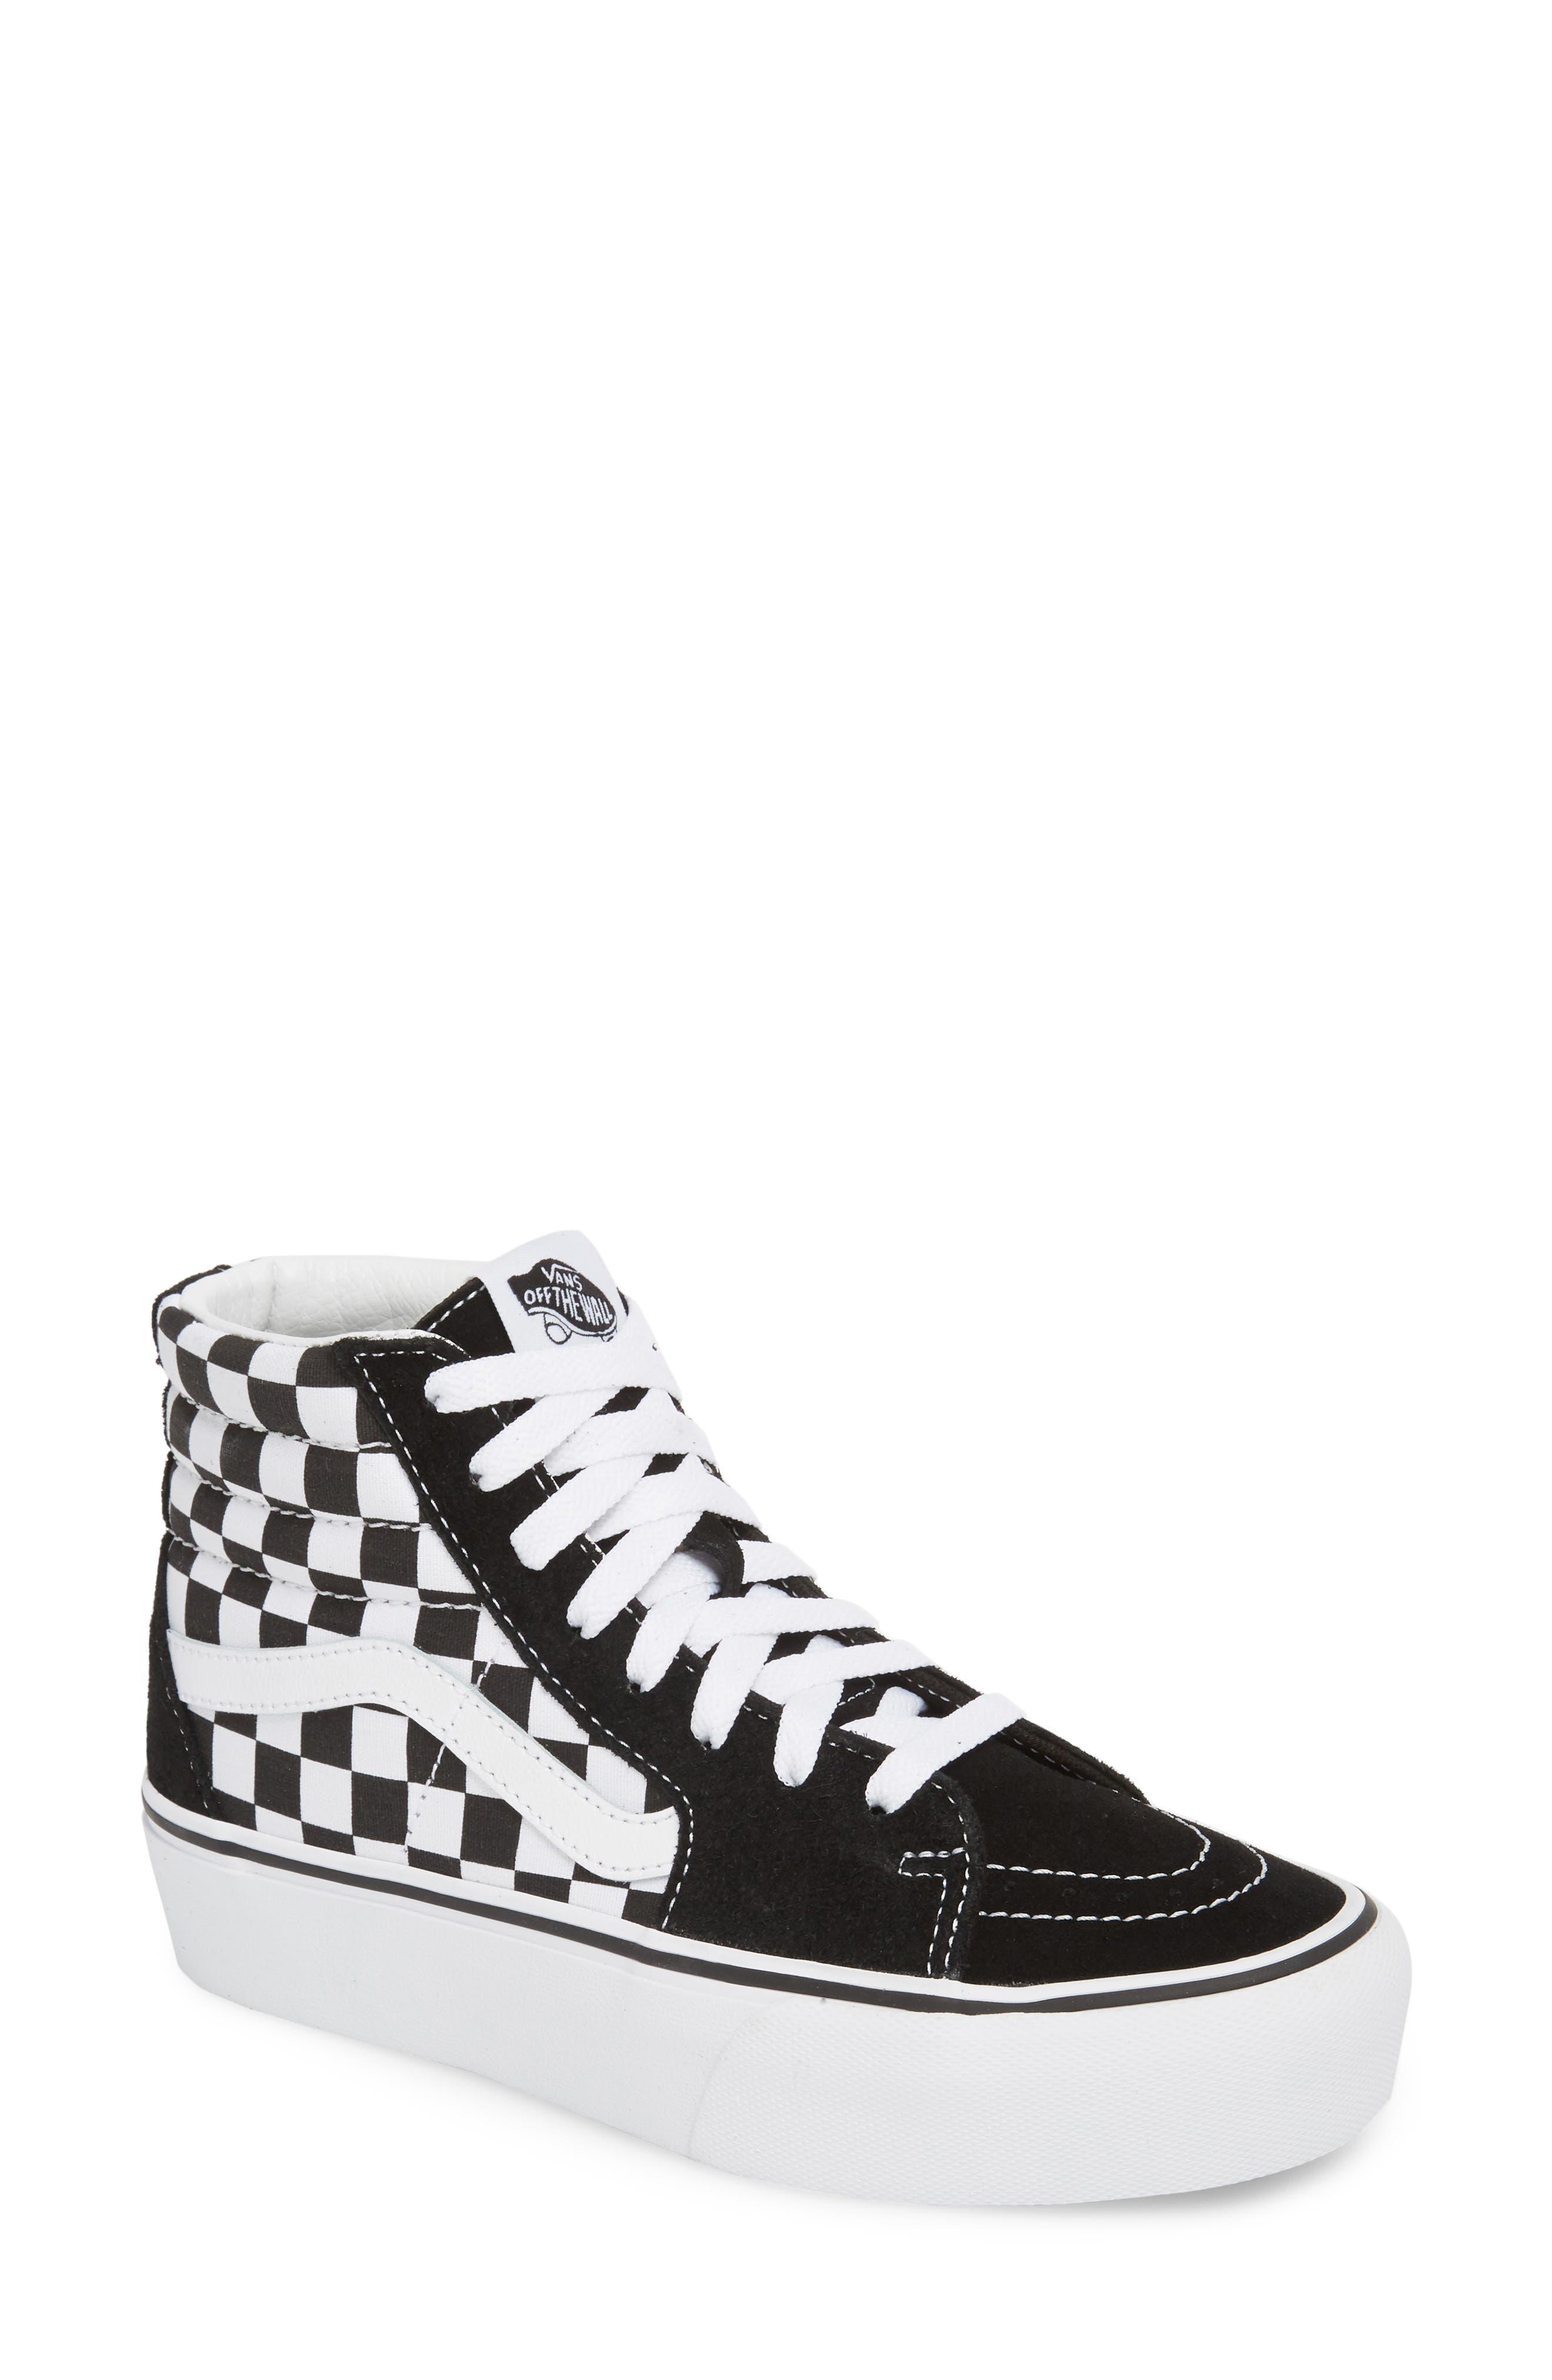 UA Sk8-Hi Platform Checkerboard Sneaker,                             Main thumbnail 1, color,                             CHECKER BOARD/ TRUE WHITE